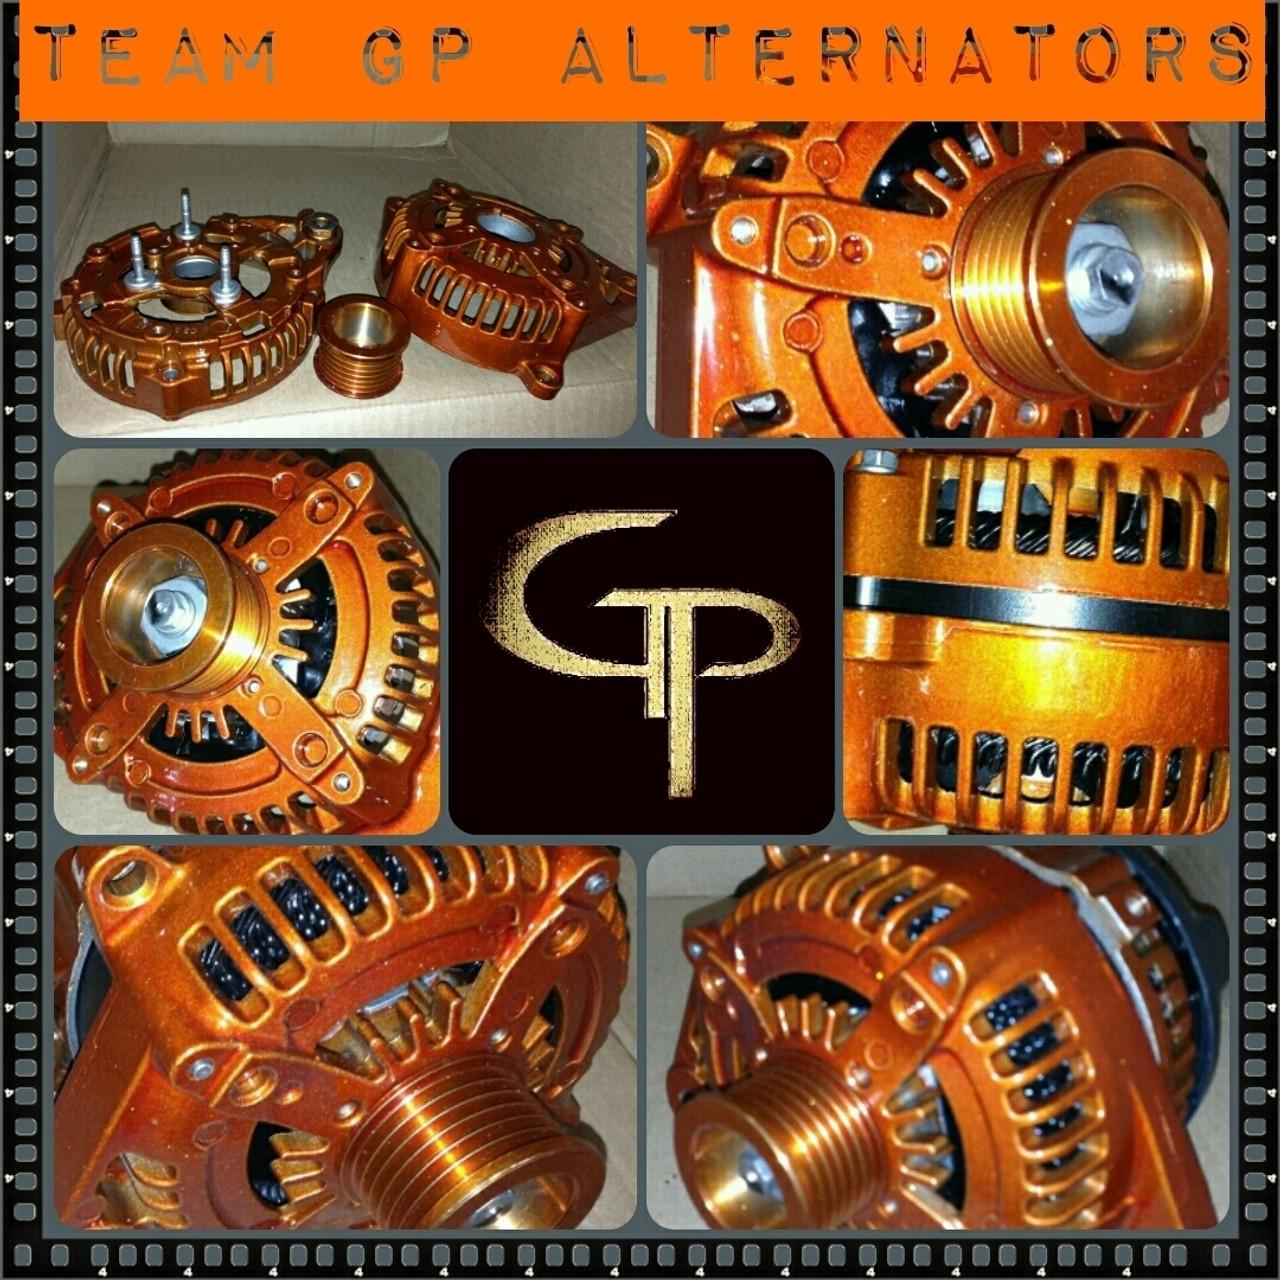 TOYOTA CAMRY 2.5L -2010-2014- 300AMP TEAM GP Alternator